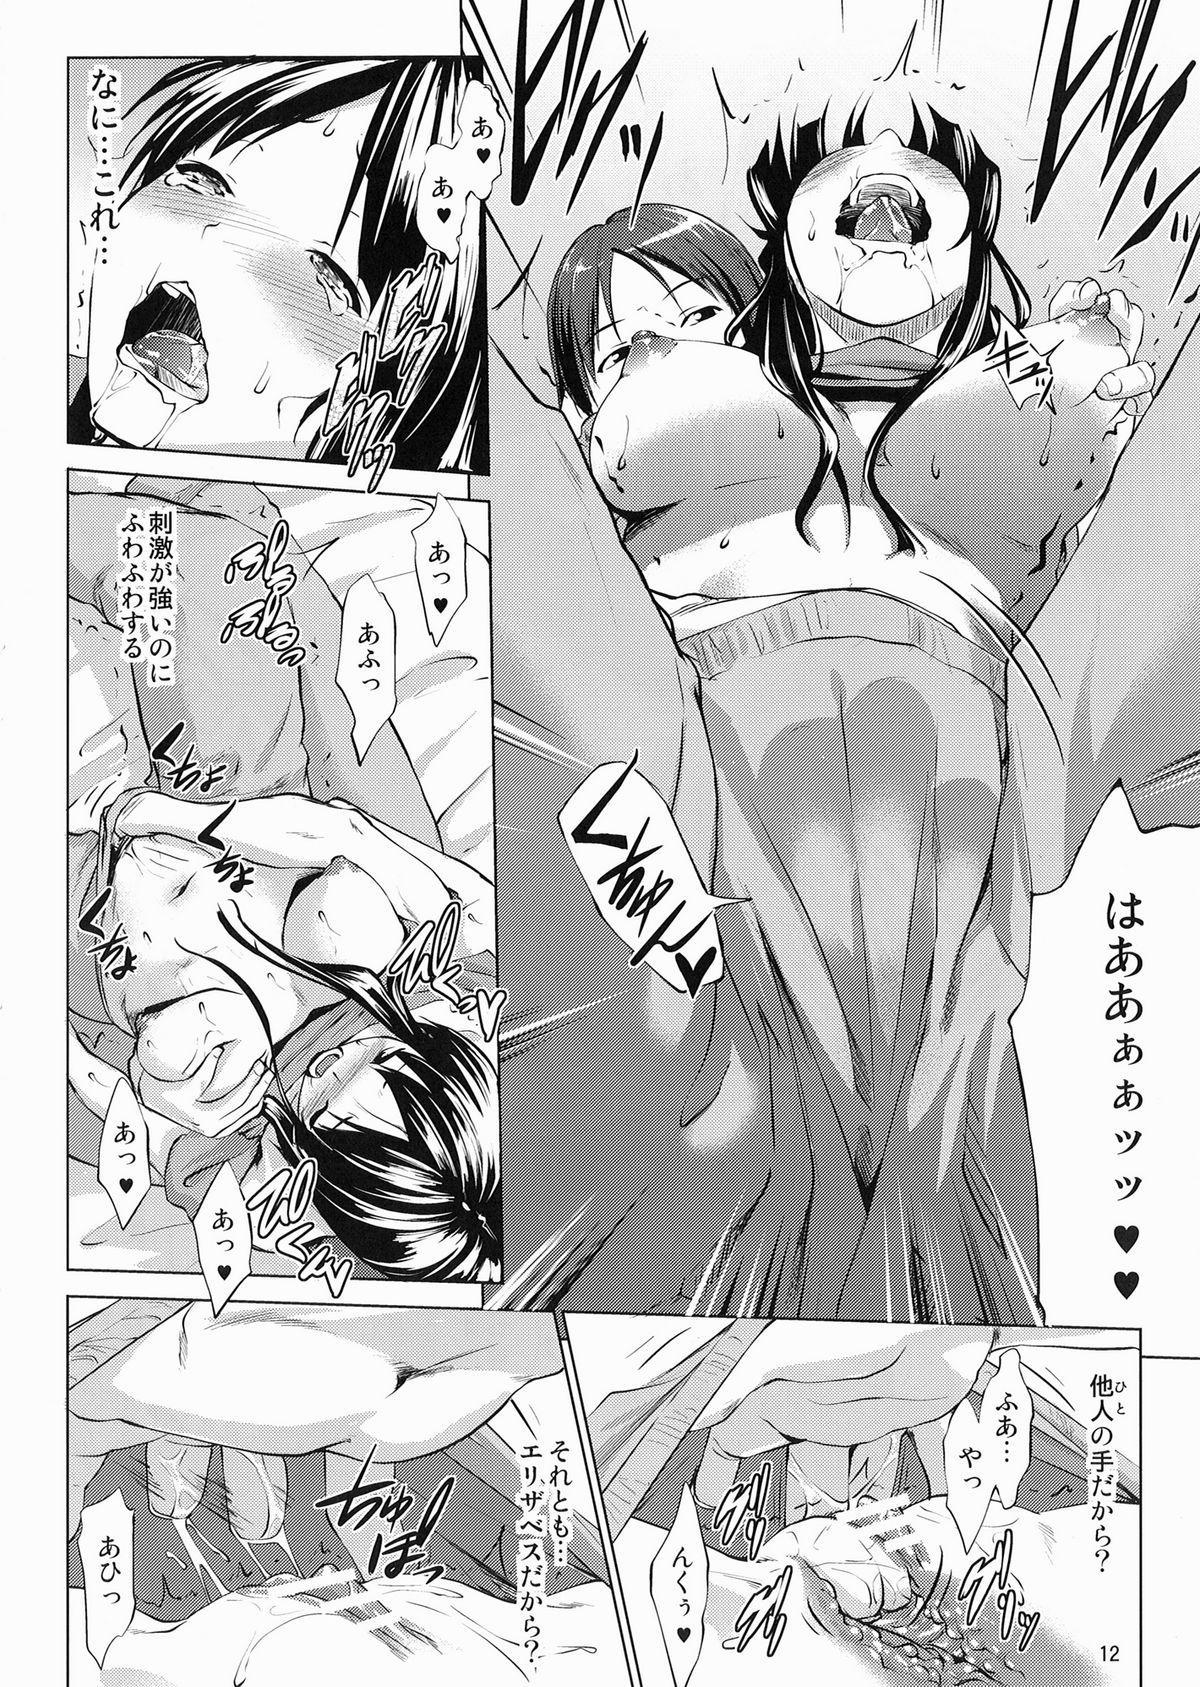 SukiSuki ☆ Elizabeth 11